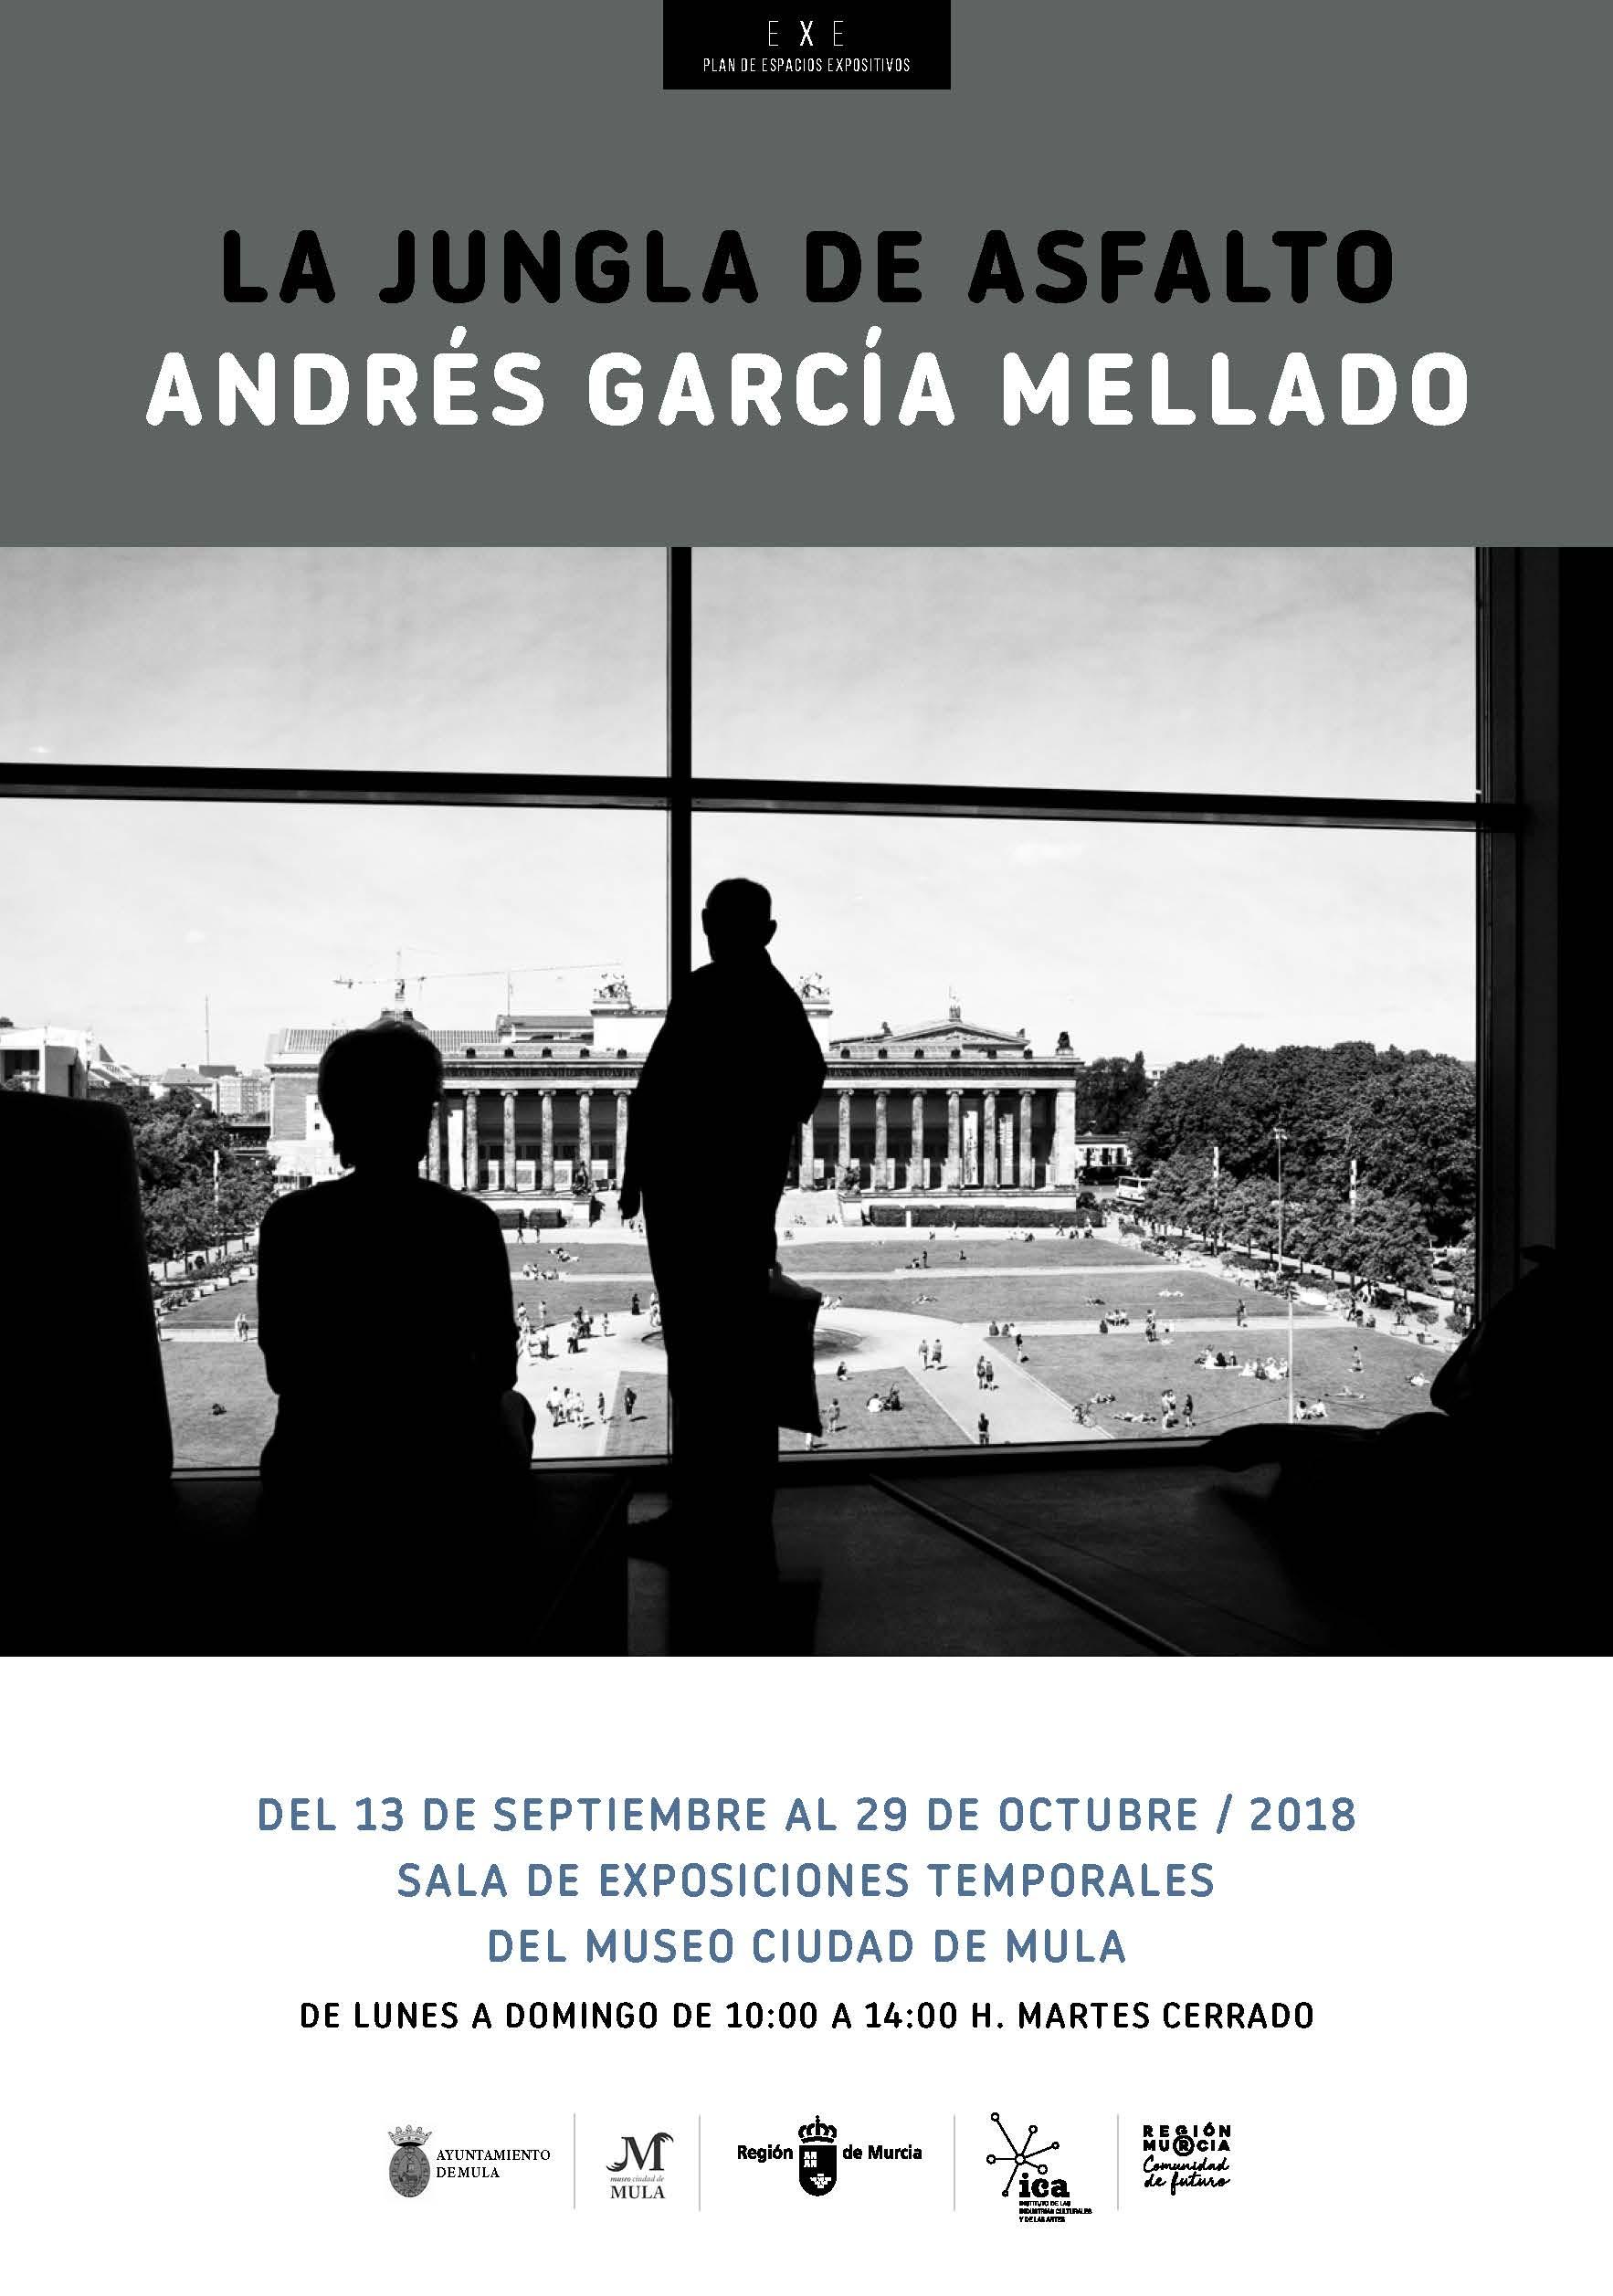 CARTEL-Andrés-García-Mellado-en-Mula.jpg